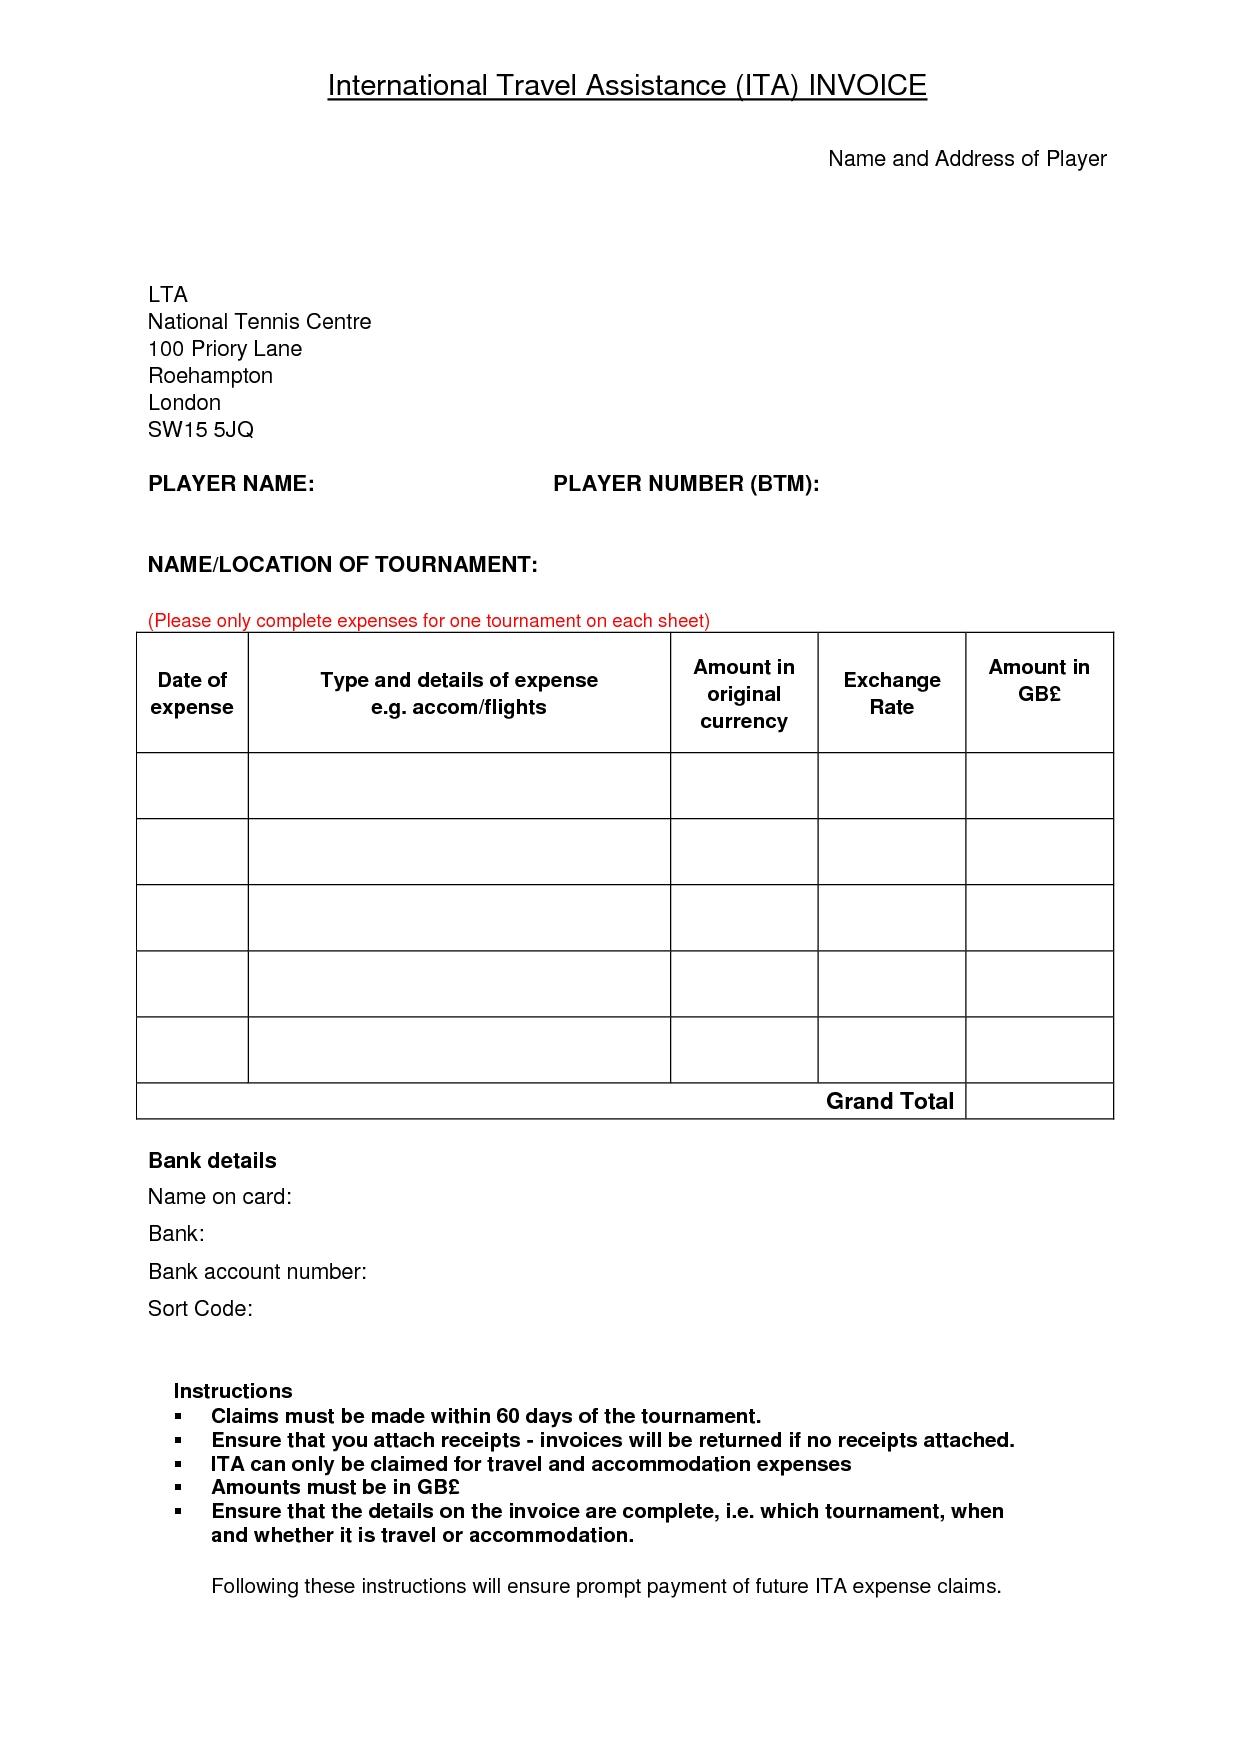 car travels bill | dromffo.top travel invoice template